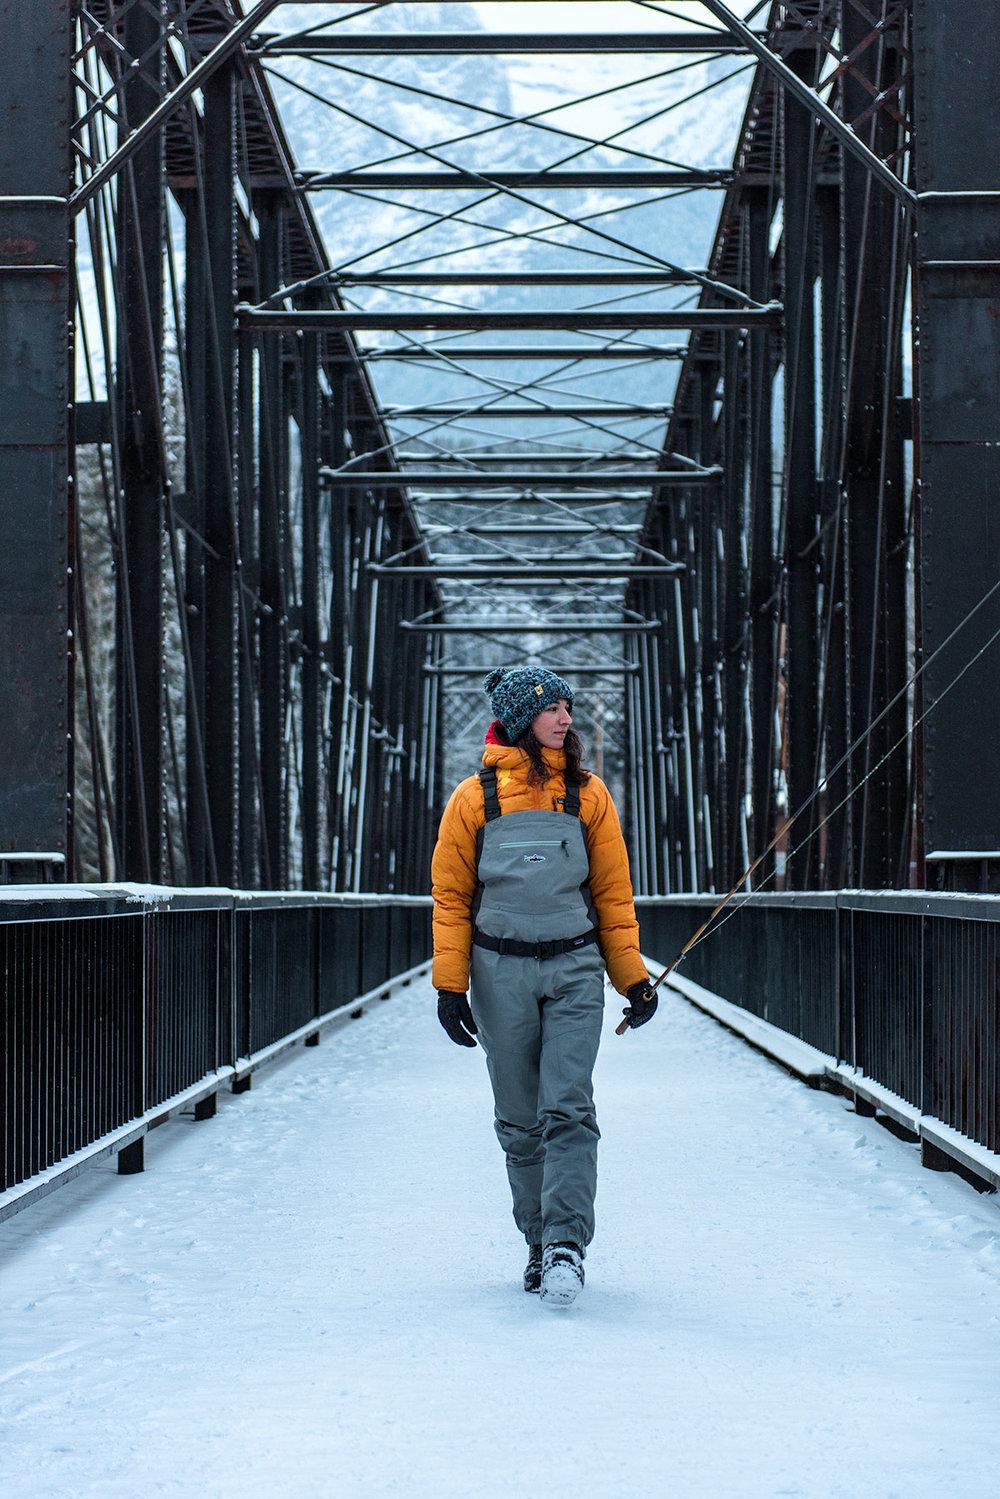 austin-trigg-patagonia-banff-alberta-winter-bow-river-fly-fishing-bridge-canmore-mountains.jpg